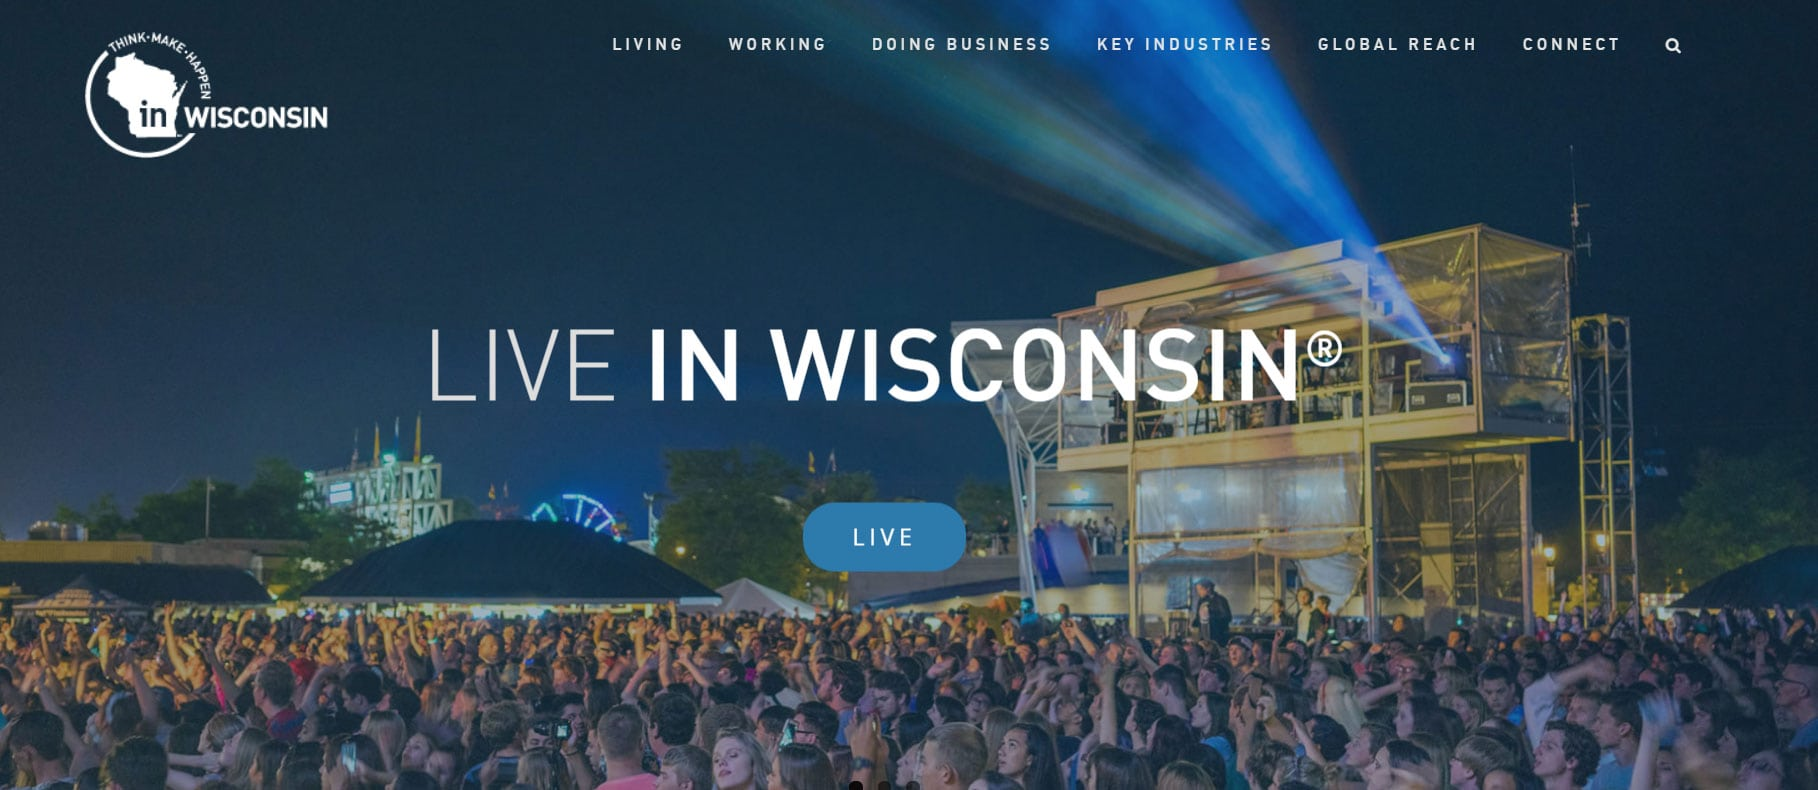 Inwisconsin.com homepage